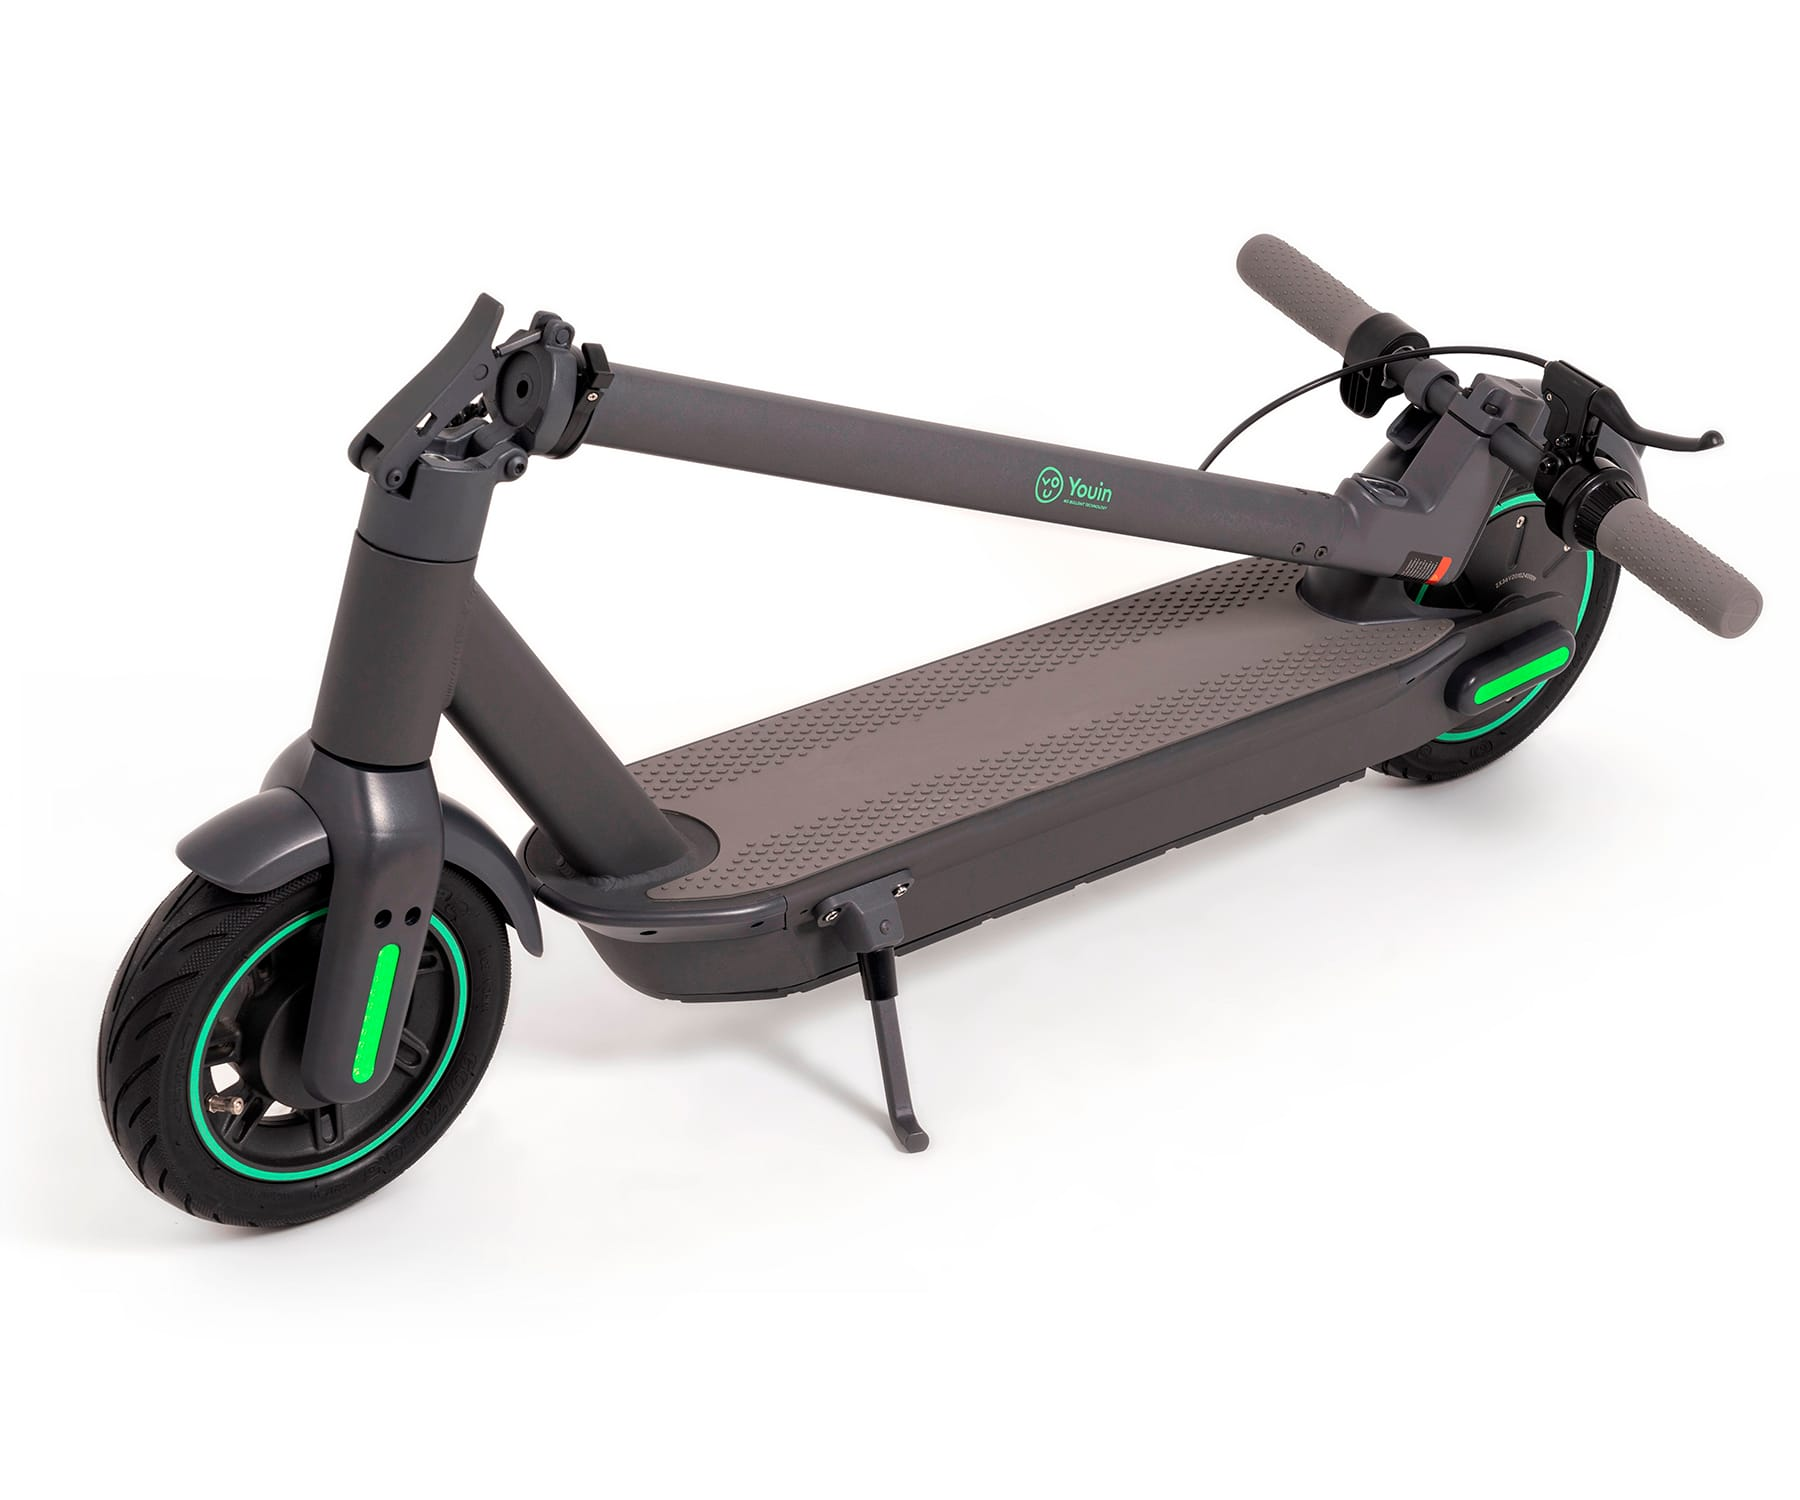 Youin Sc4000 Scooter Xl Negro/patinete Eléctrico/25 Km/h/hasta 50 Km/potencia 35... (4)